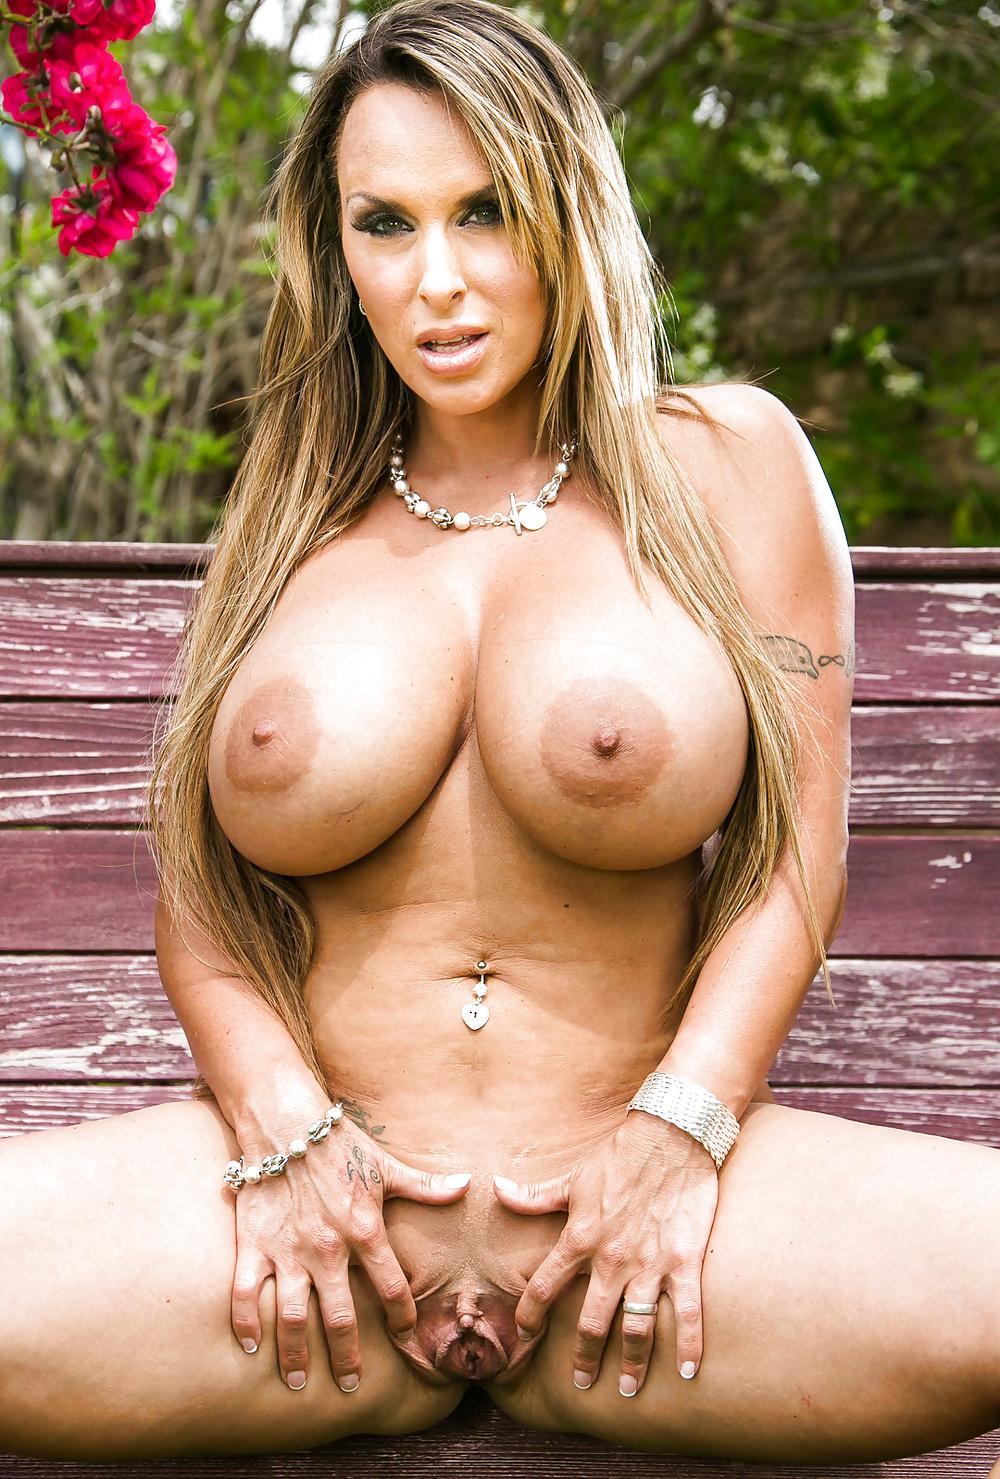 Scoreland holly halston holly holston gaga cumshots nude sexy xxx porn pics